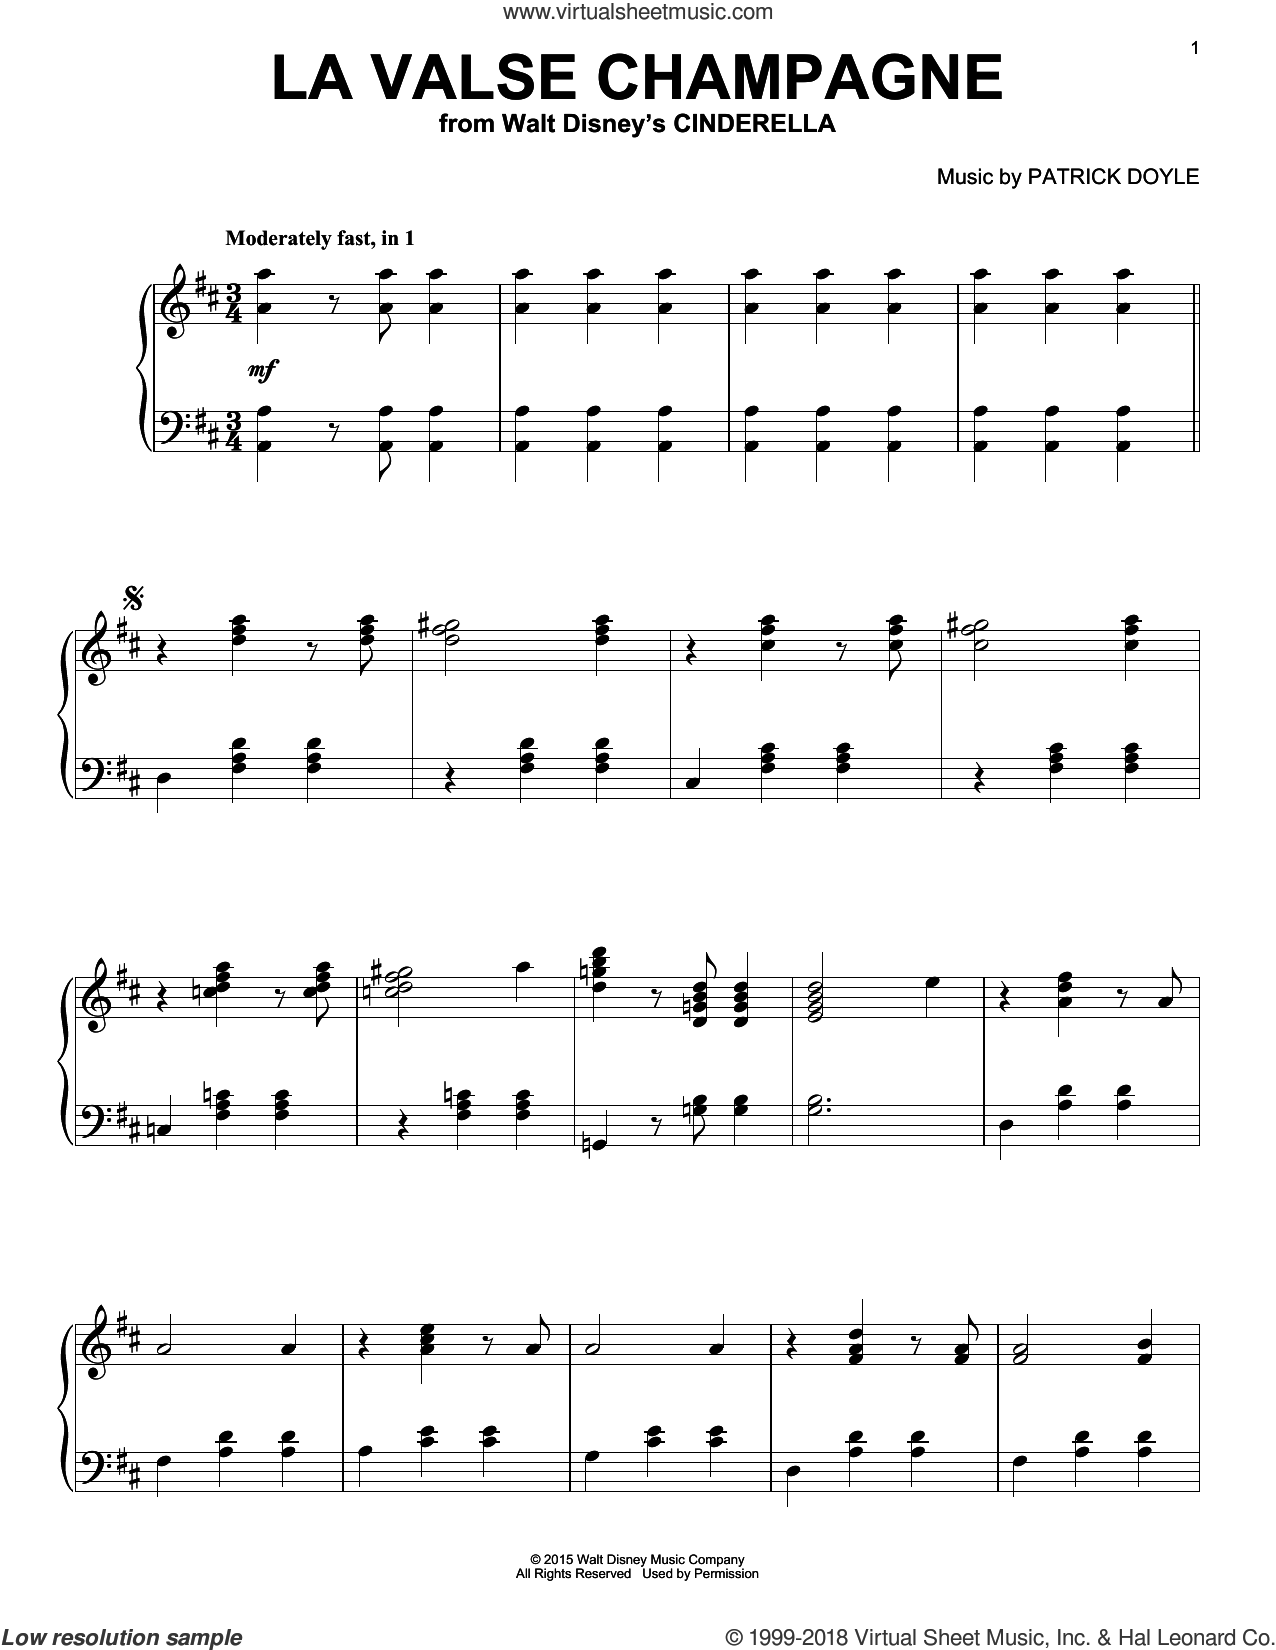 La Valse Champagne sheet music for piano solo by Patrick Doyle, intermediate skill level